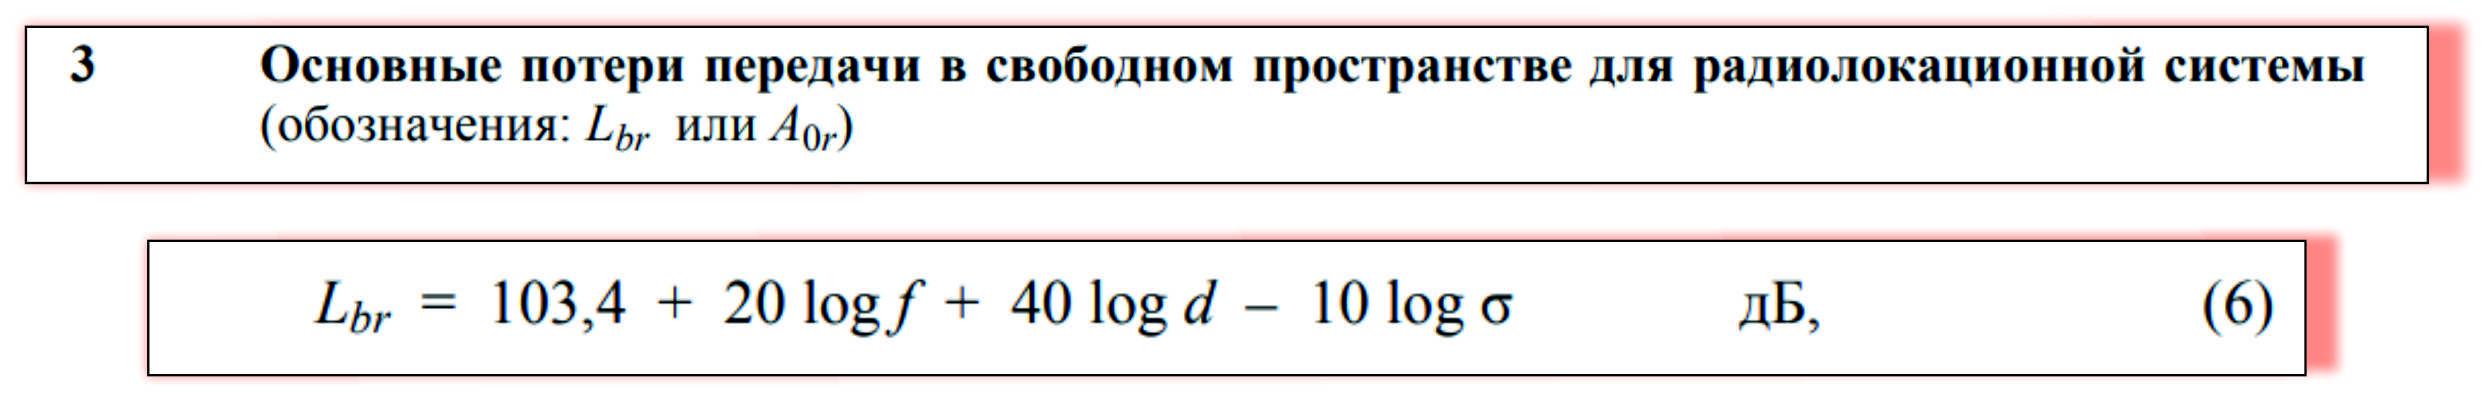 http://images.vfl.ru/ii/1618486824/5ef8ead4/34090969.jpg